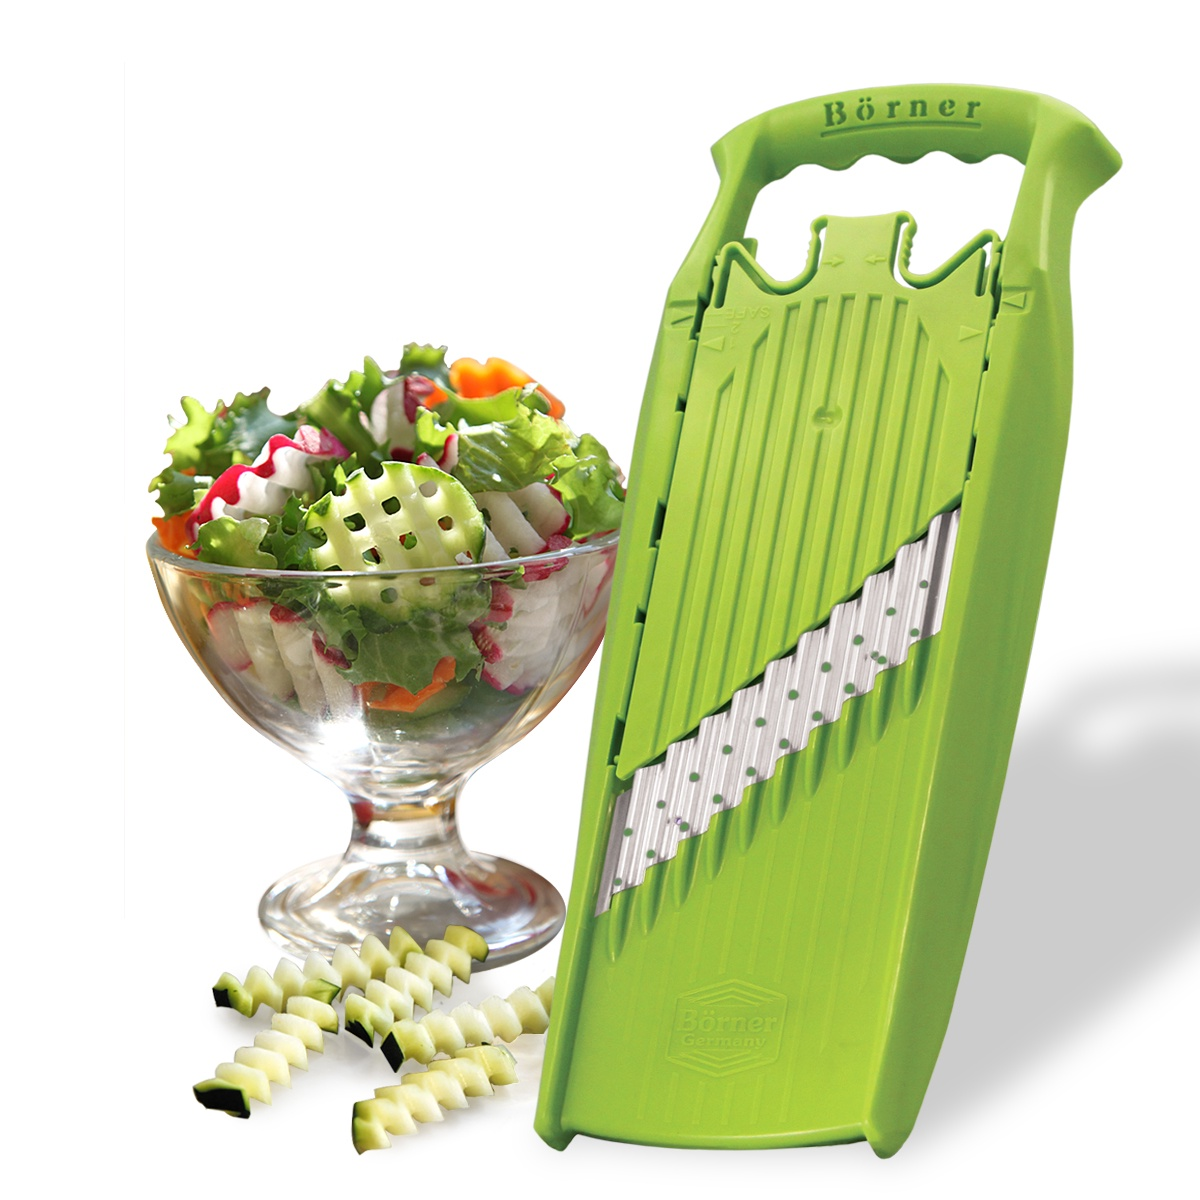 Овощерезка Borner Prima. Арт-декор (Германия), цвет: салатовый овощерезка для декораций borner классика германия цвет салатовый